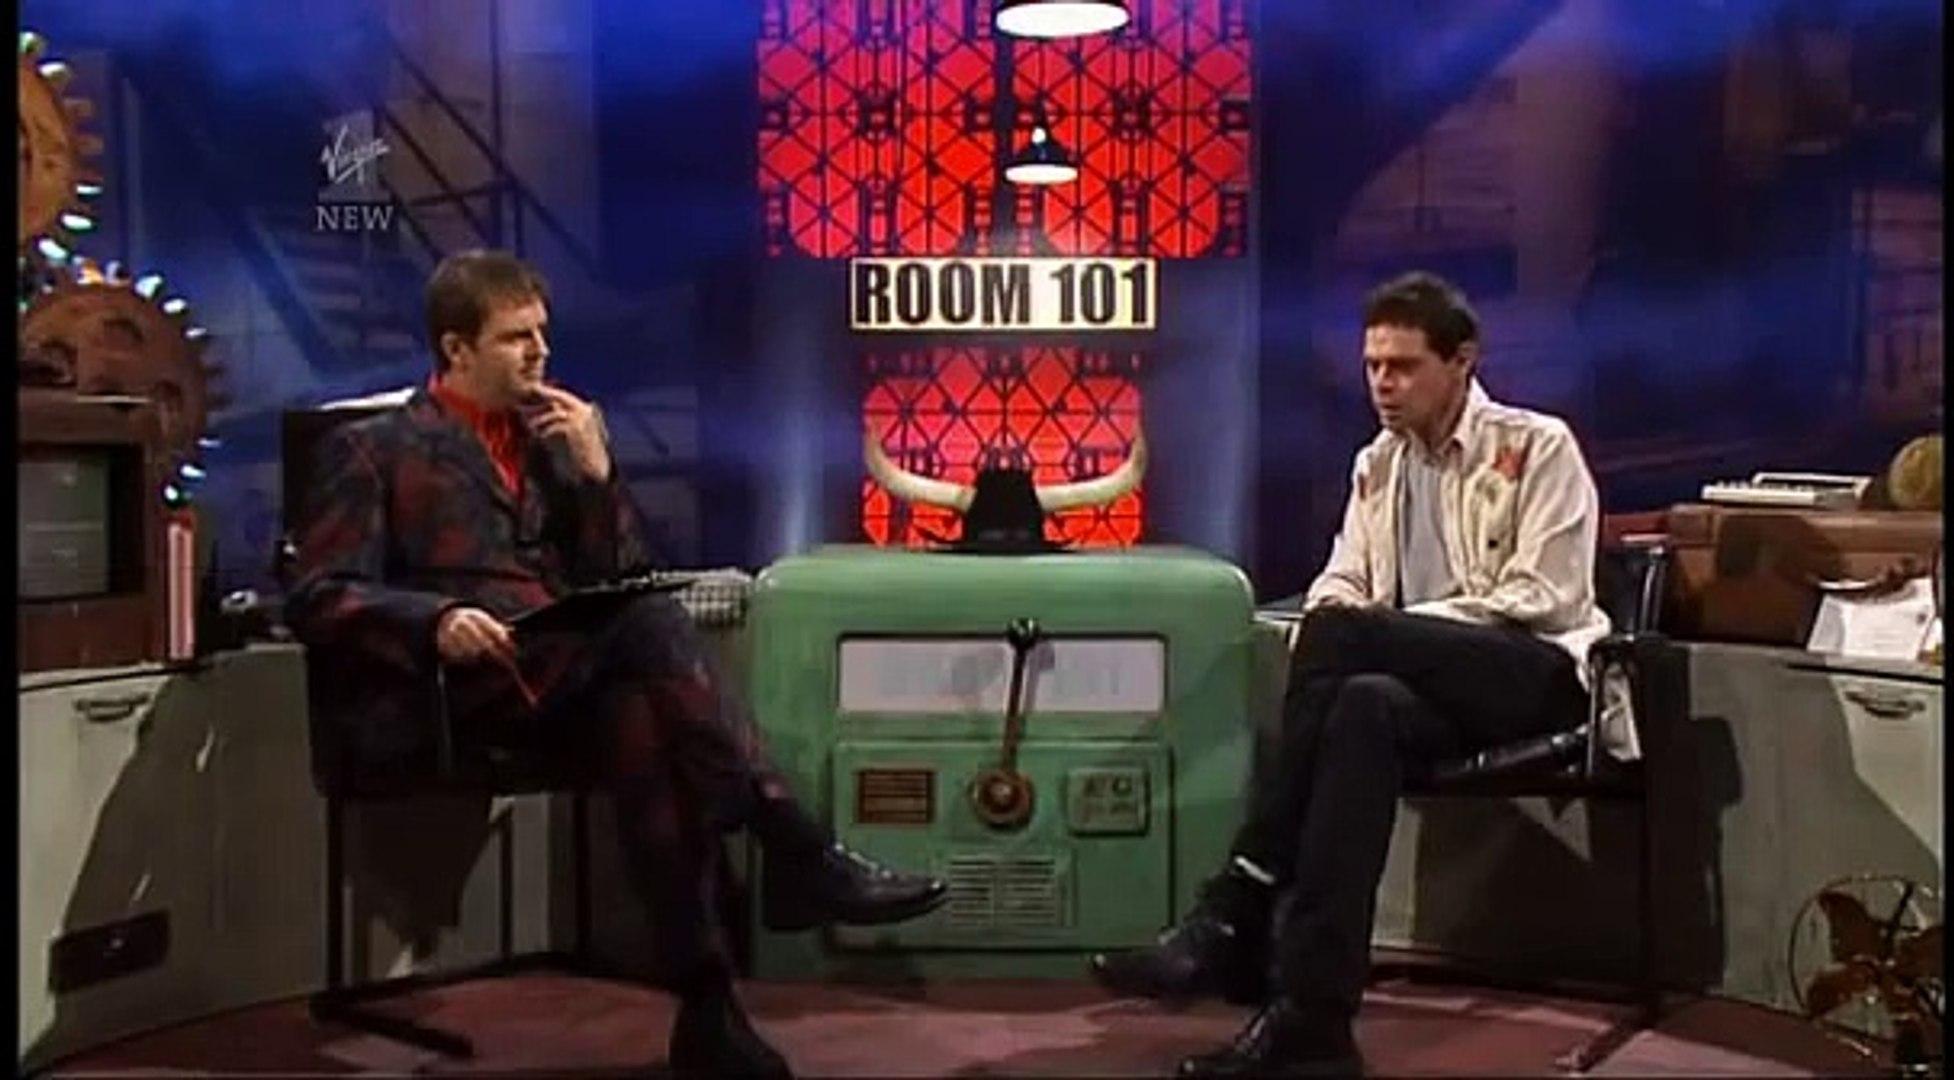 'Room 101' (BBC)